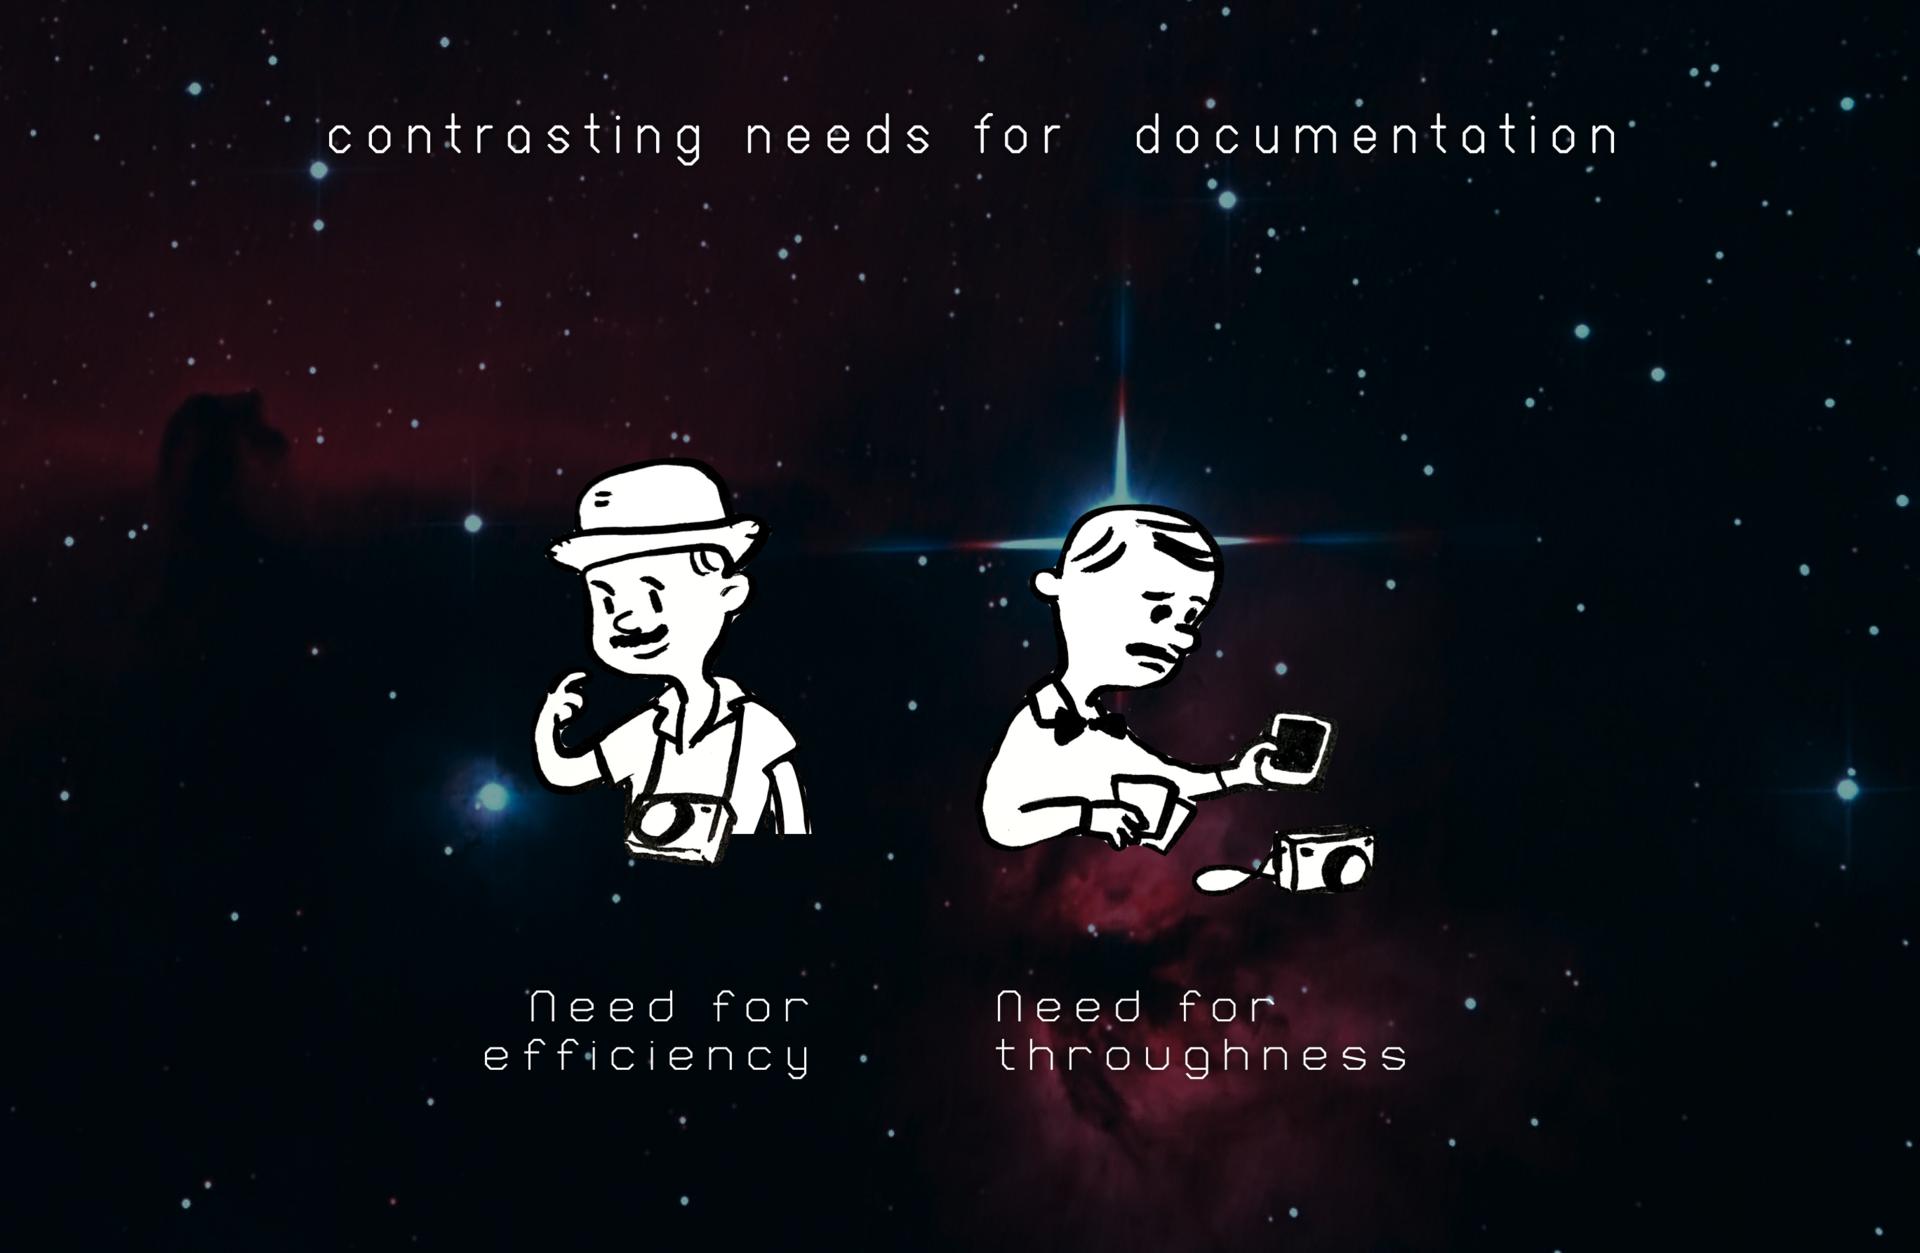 Contrasting needs for documentation